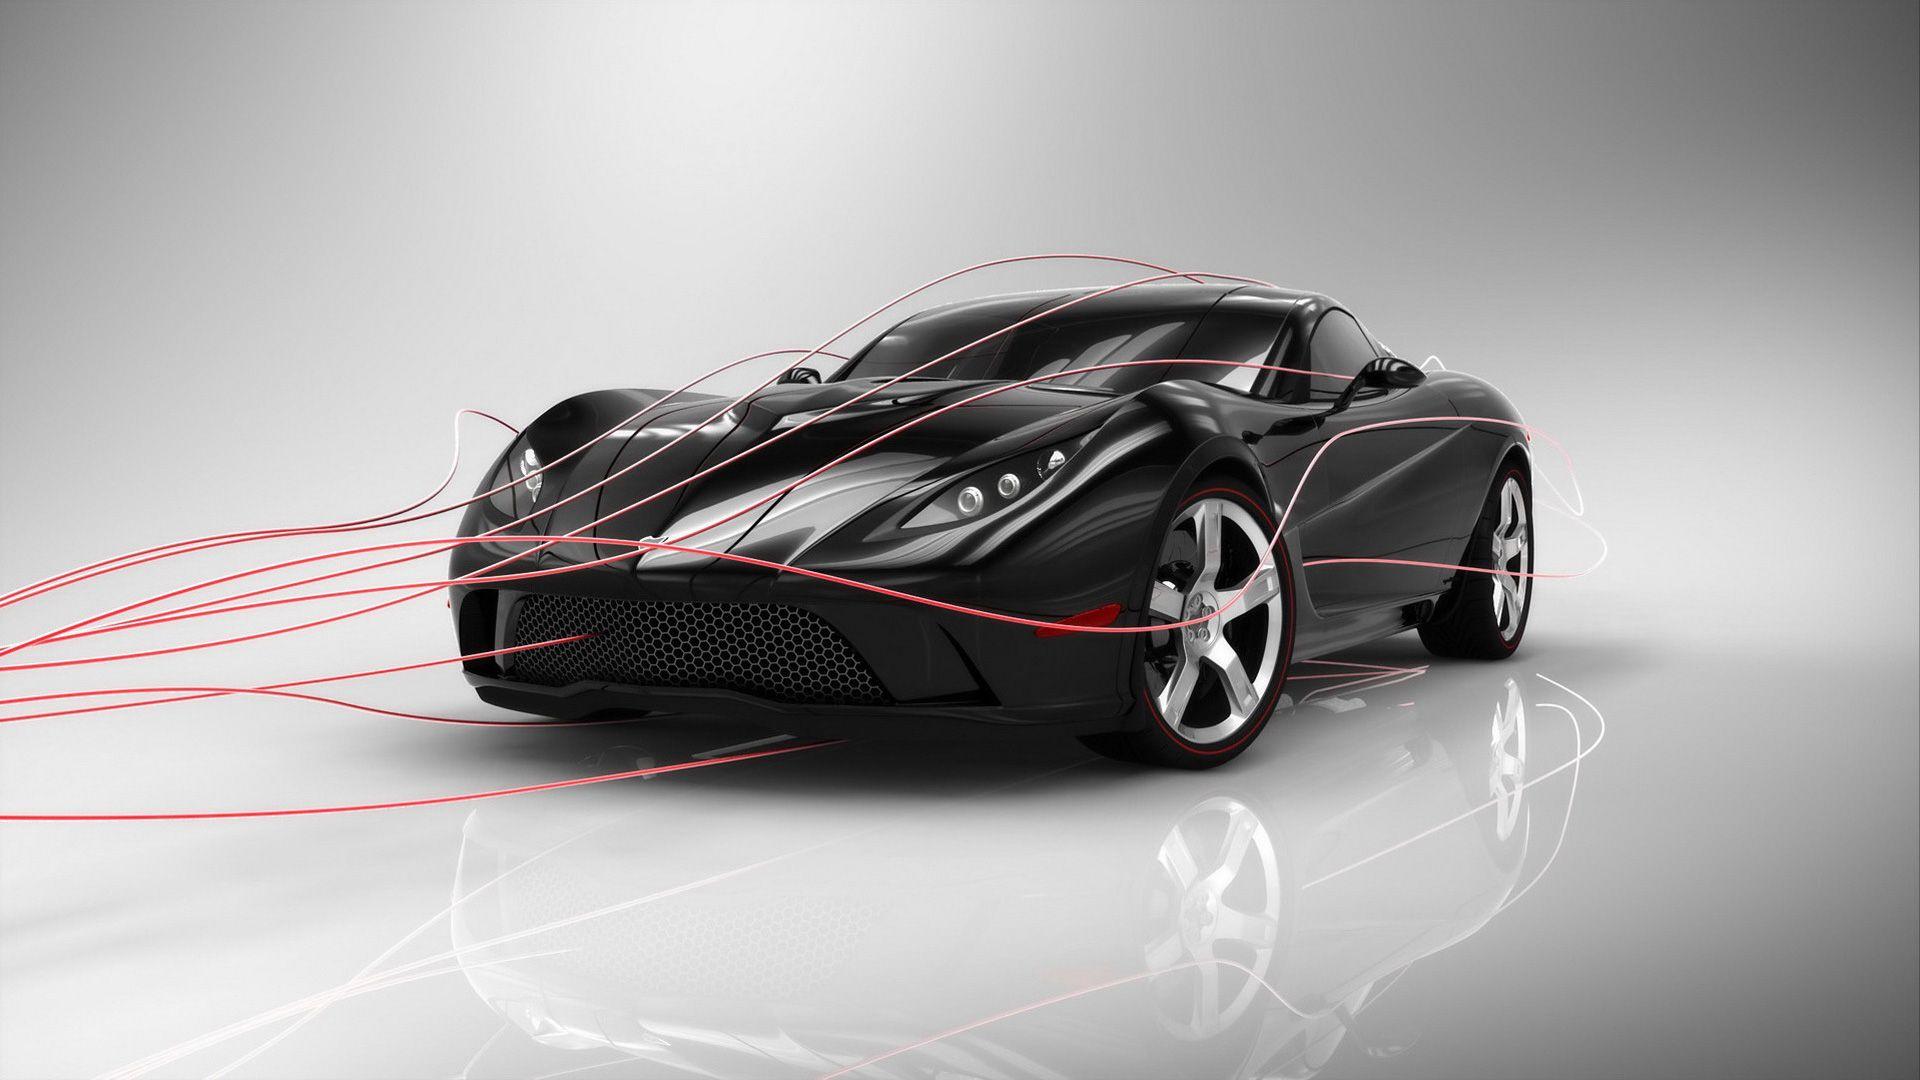 Pictures For Desktop 3d Cars, Car